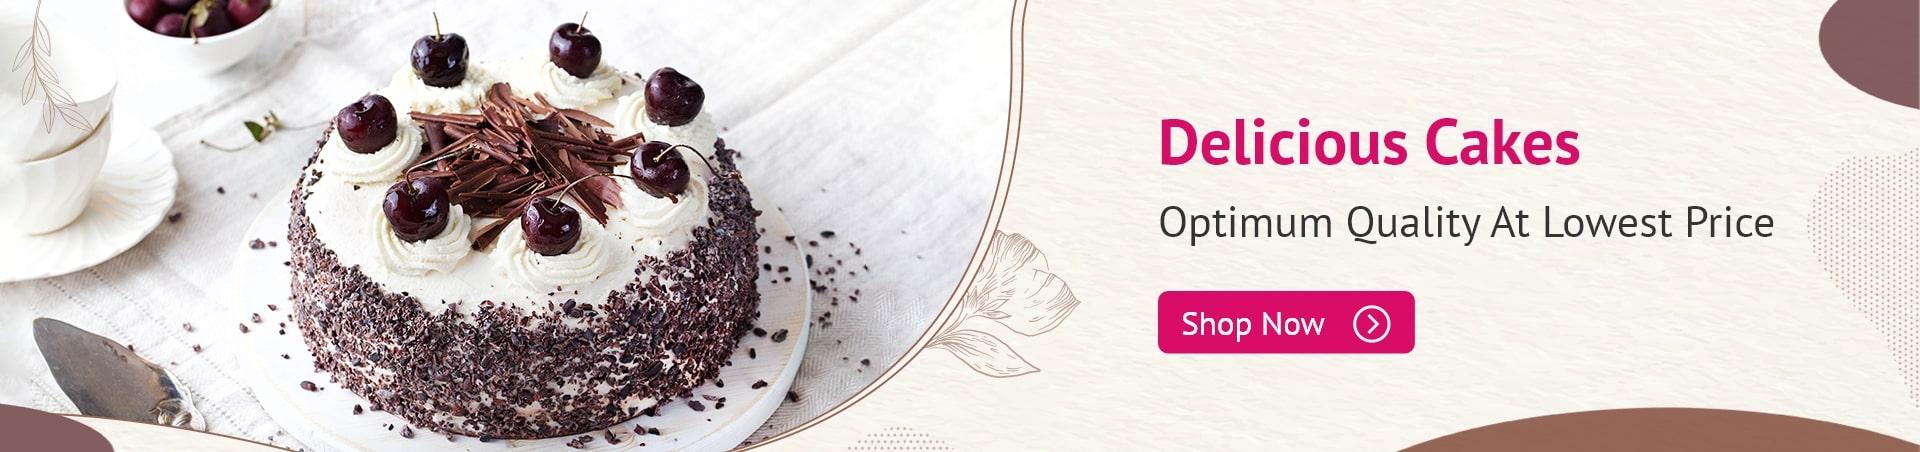 Send Birthday Cakes to India